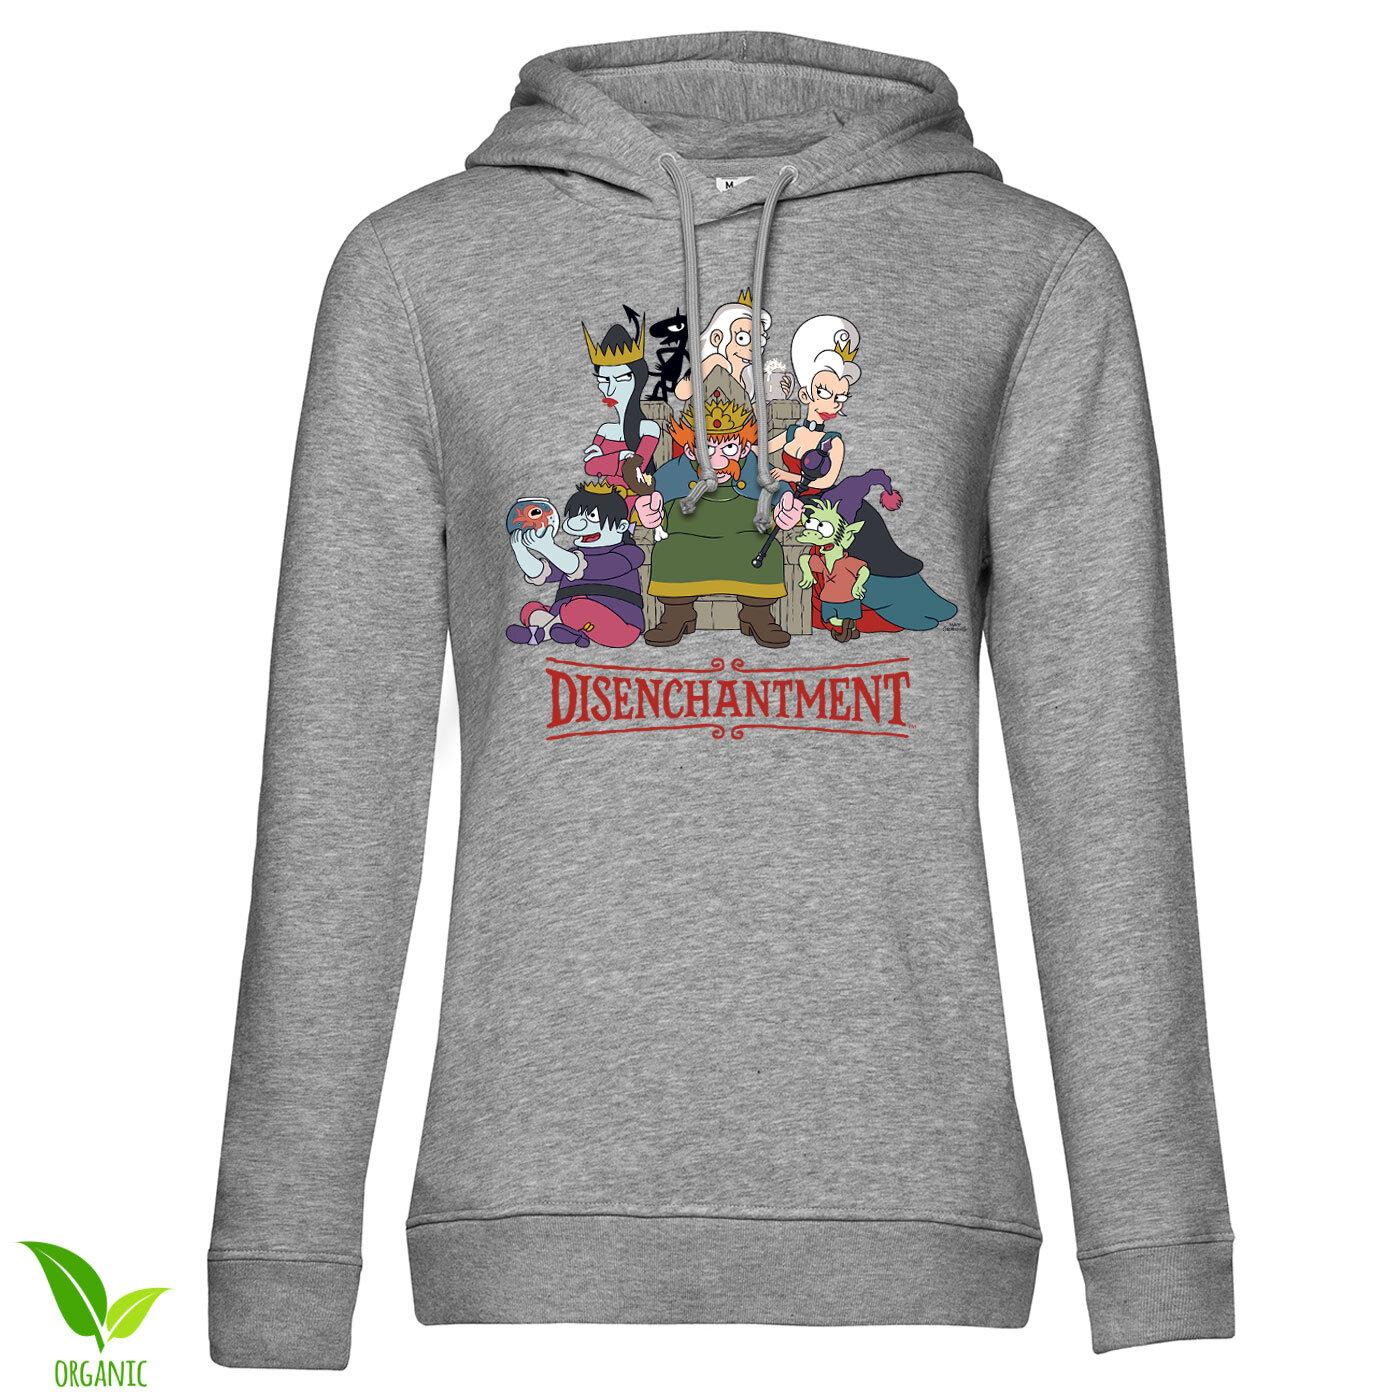 Disenchantment Girls Hoodie